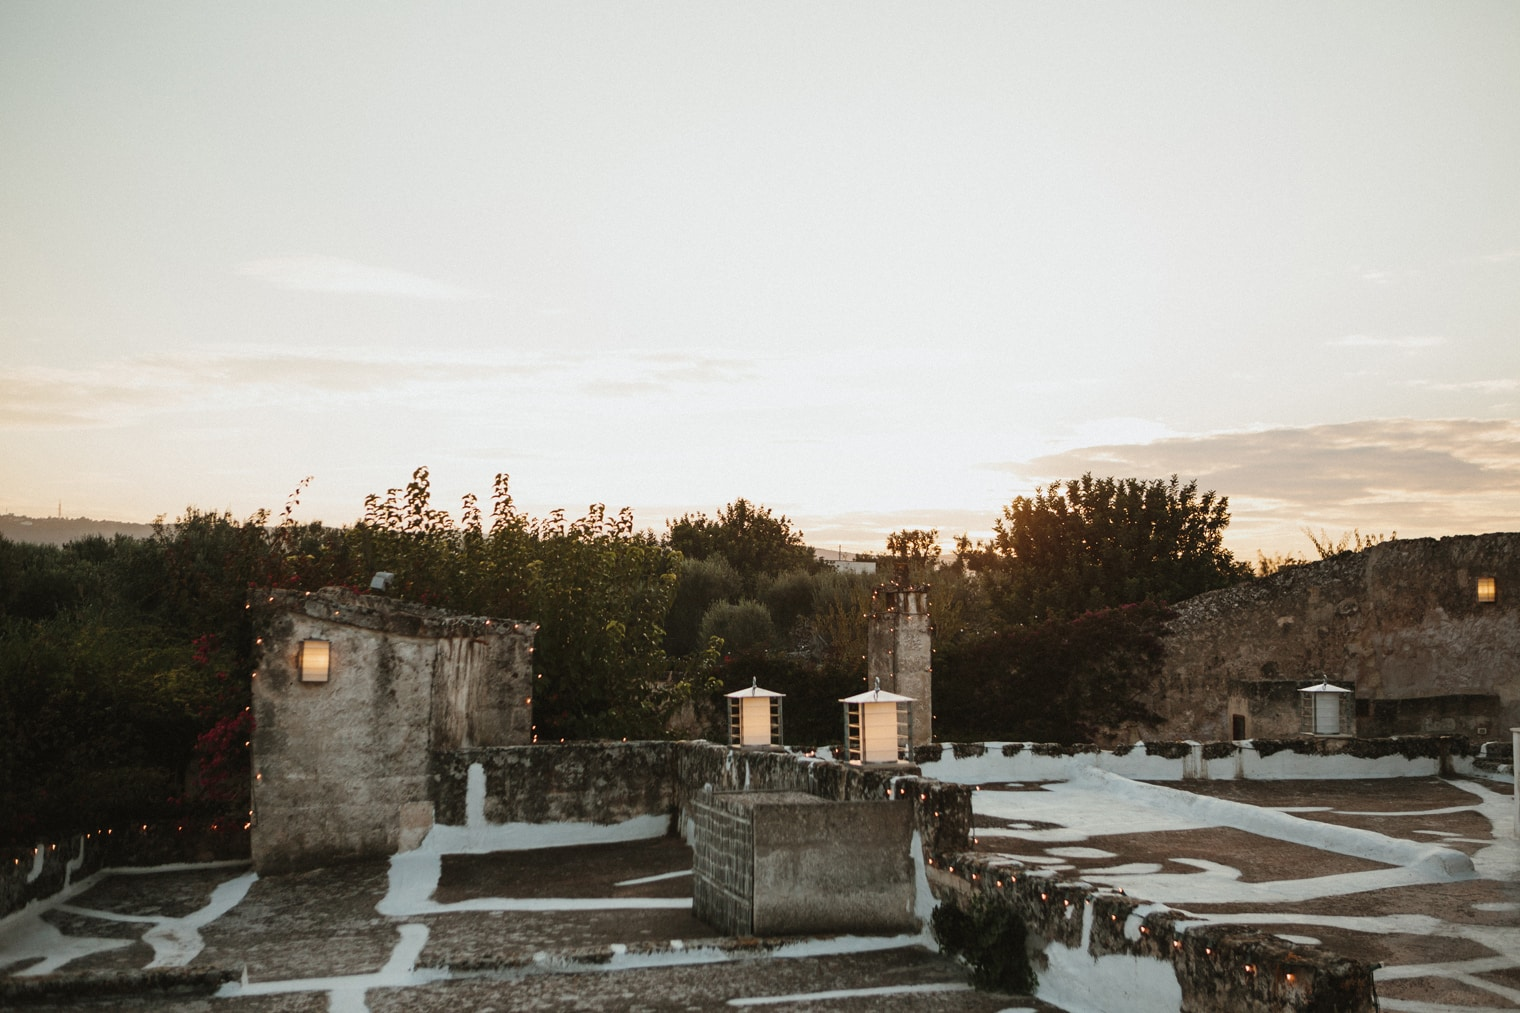 masseria de torre coccaro